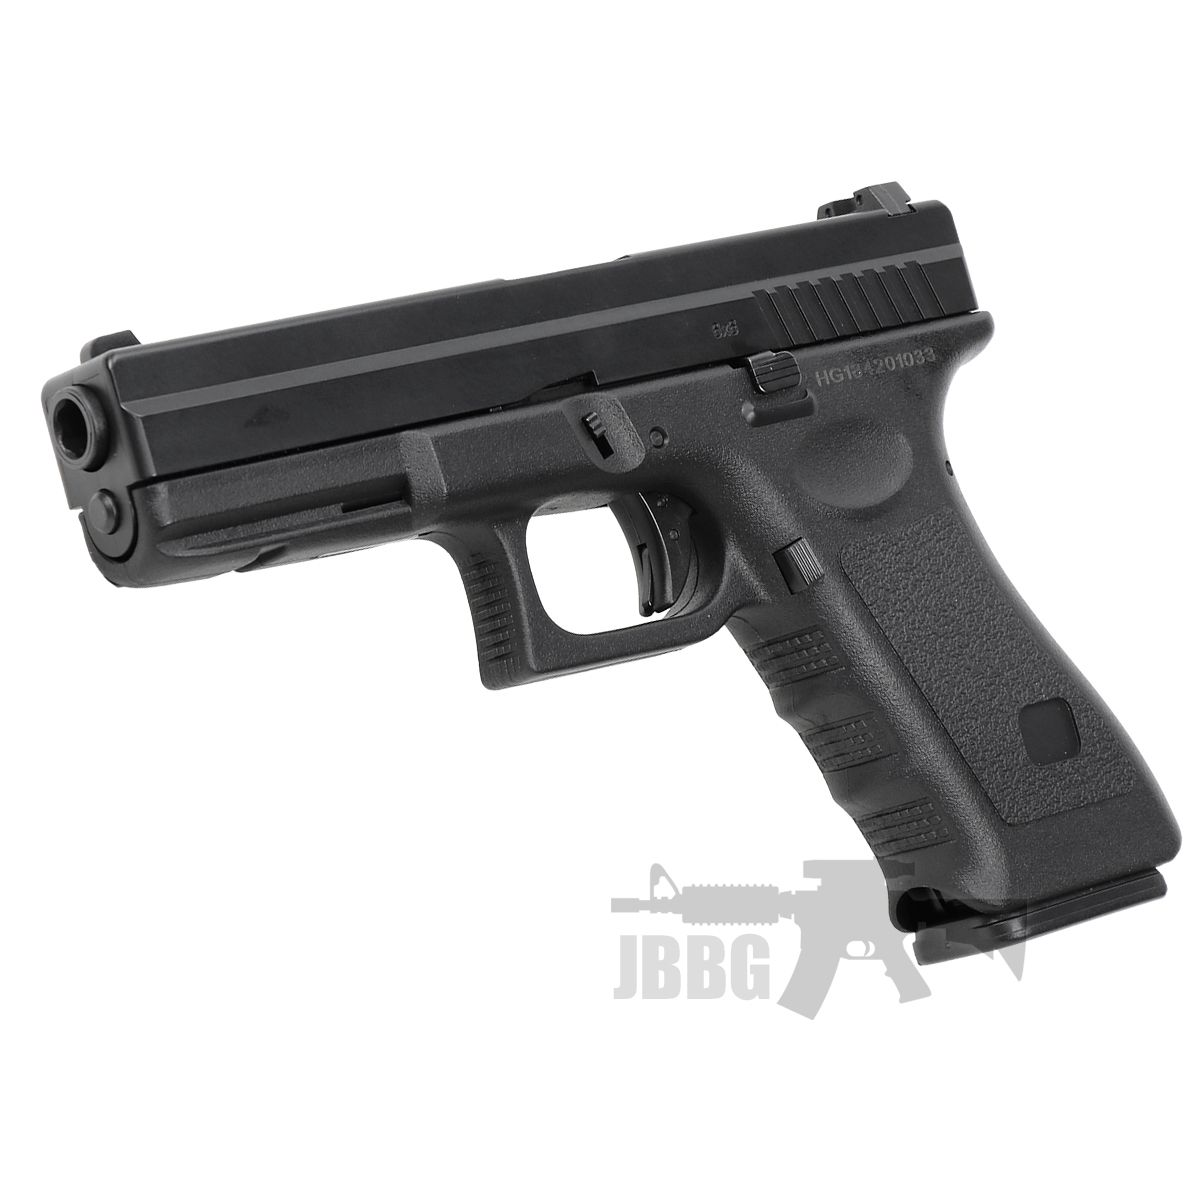 hg184 airsoft bb pistol 9